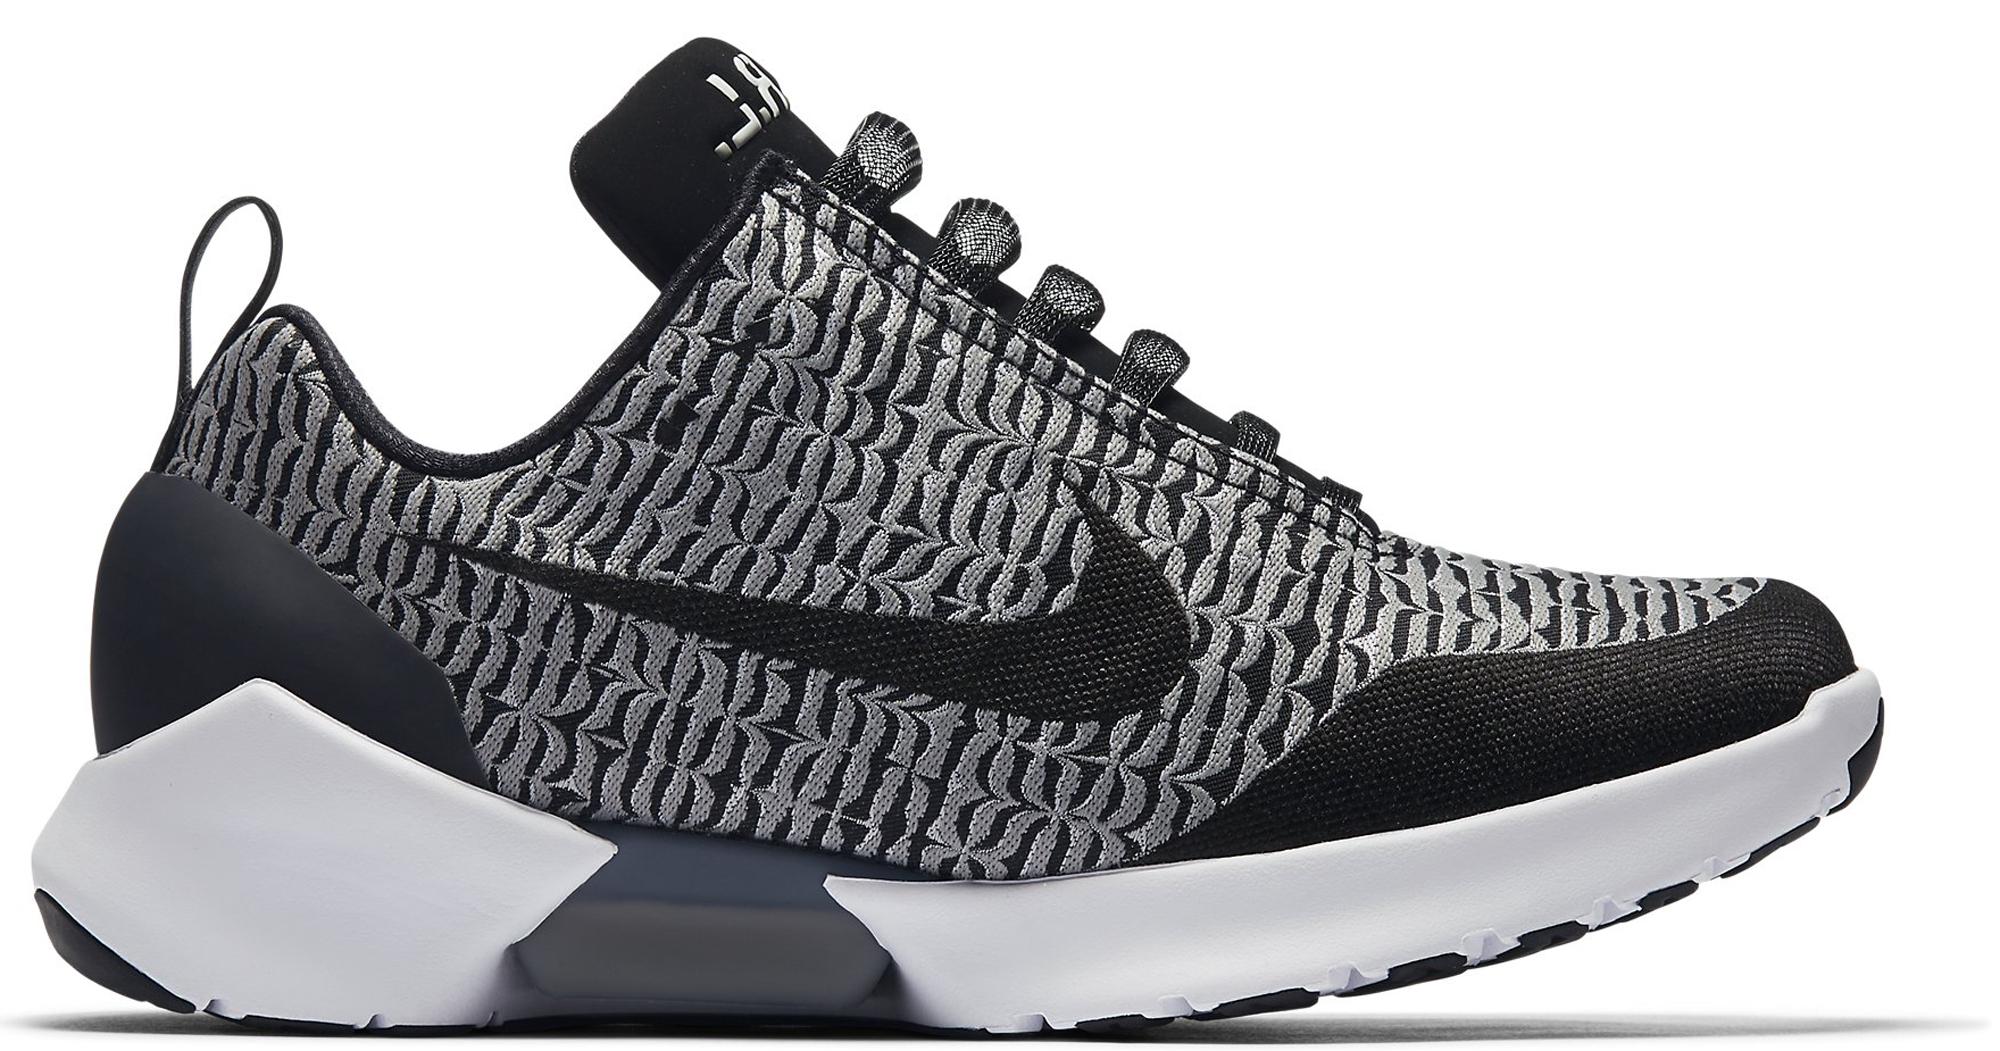 Nike HyperAdapt 1.0 Wolf Grey